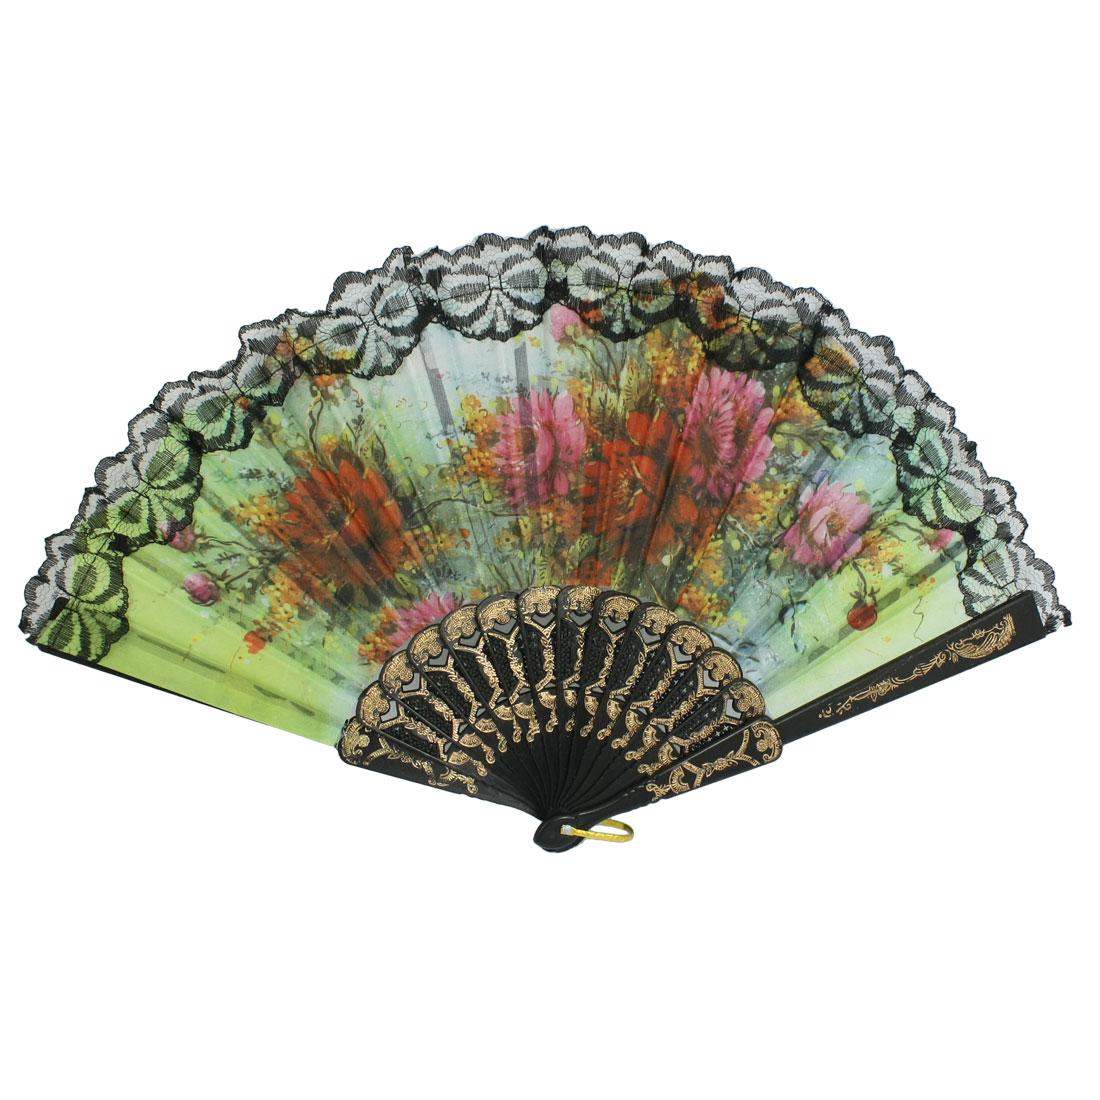 Peony Flower Print Rib Lace Trim Dancing Hand Fan Lemon Green Black w D Ring